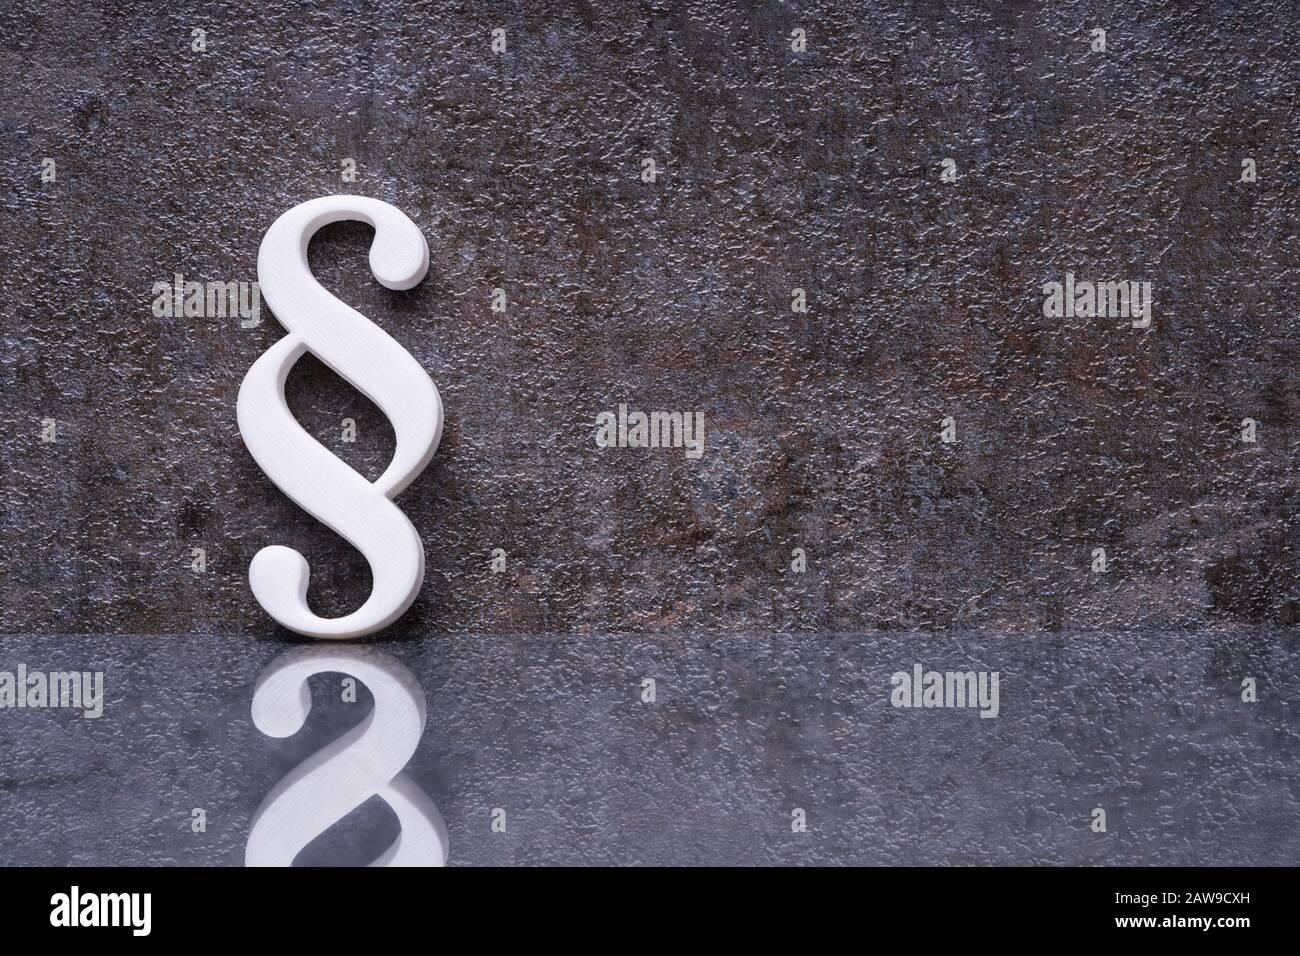 Primer Plano De Un Párrafo Símbolo Inclinada Sobre La Pared Oscura Foto de stock